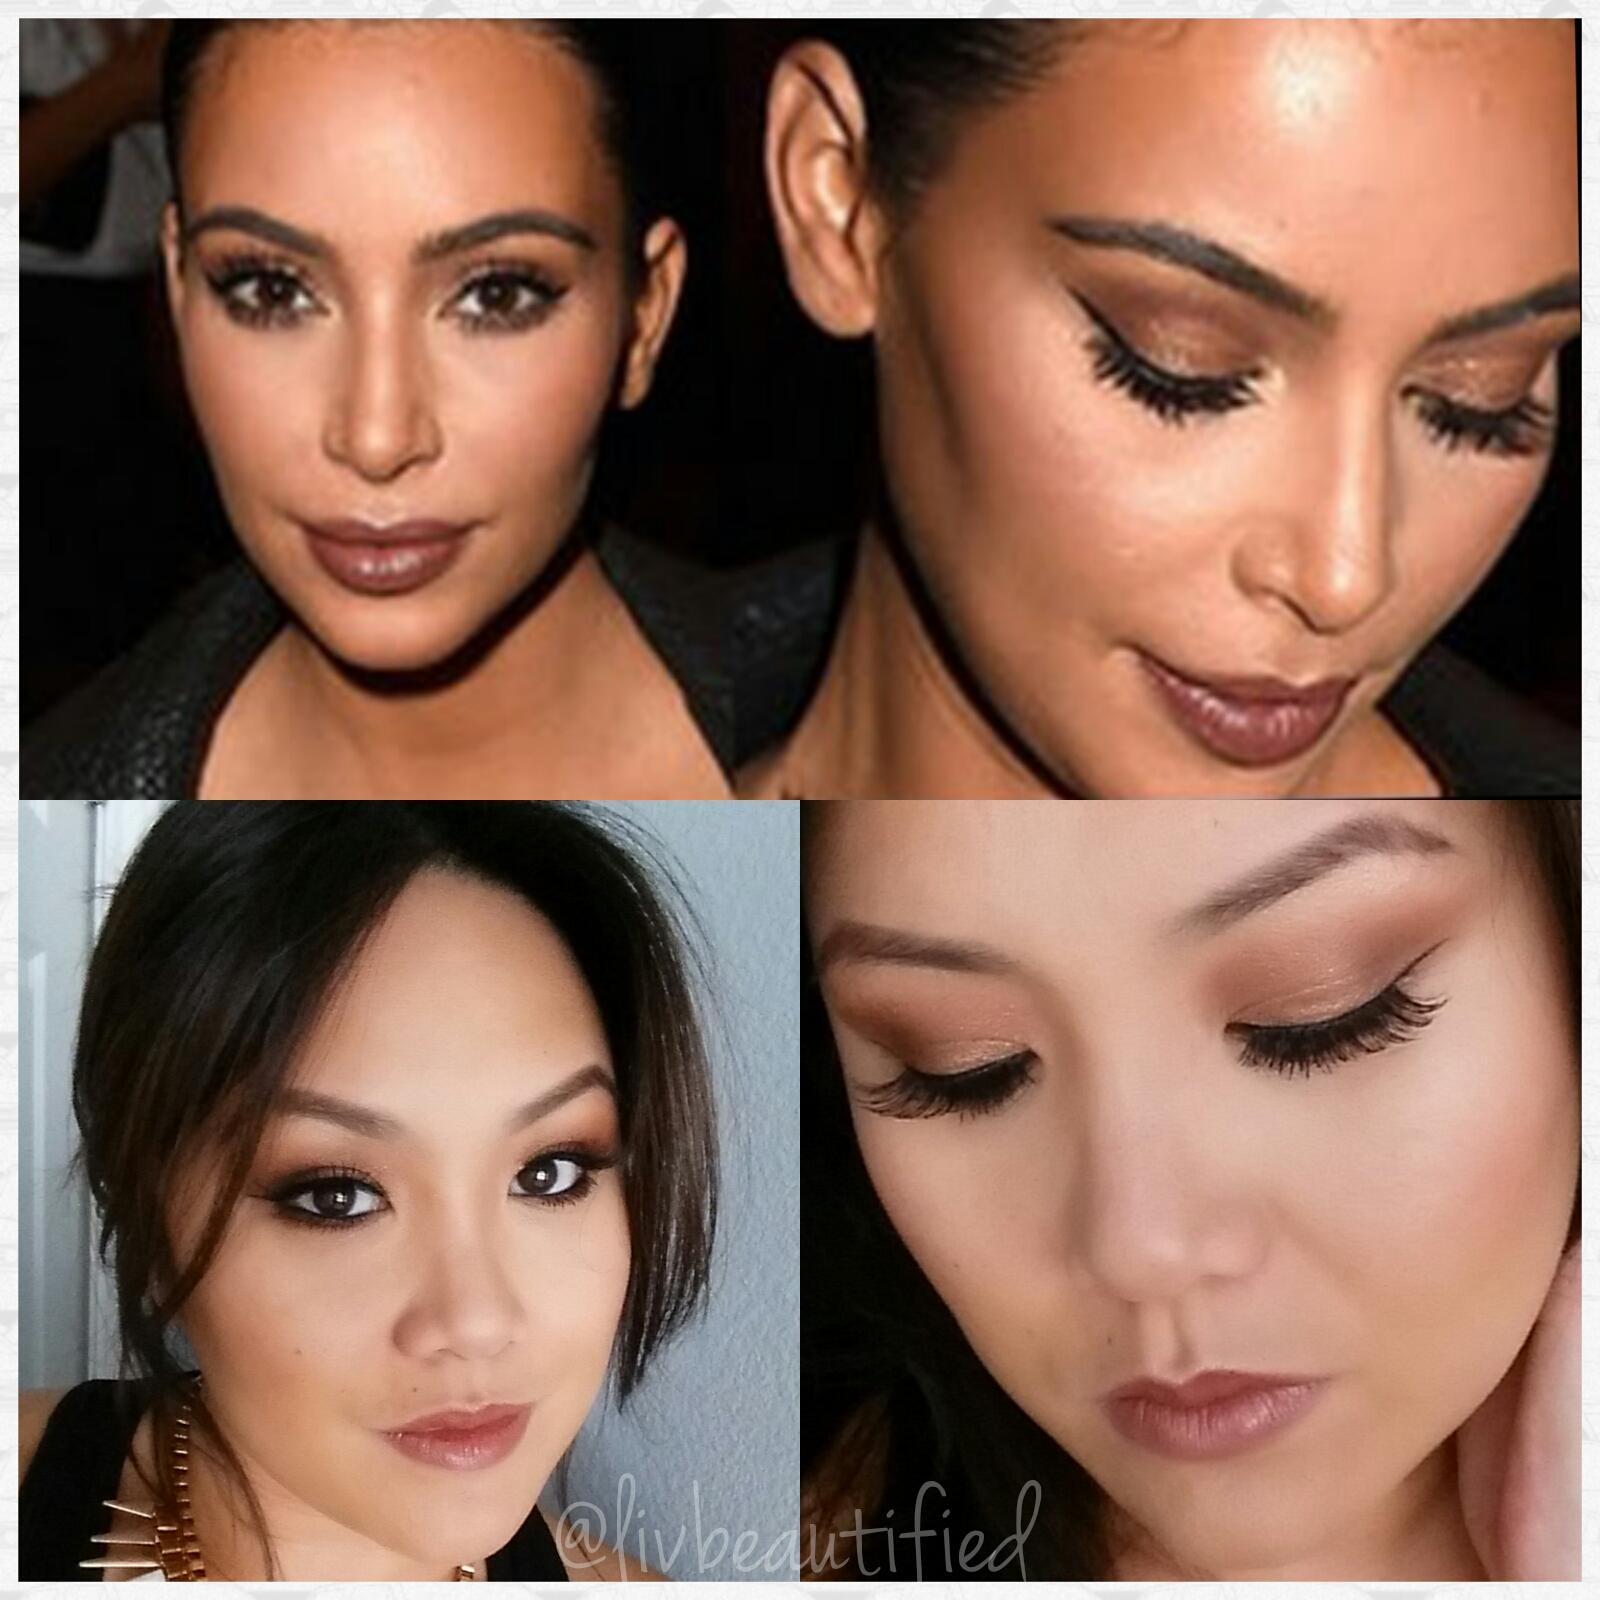 Kim Kardashian Inspired Makeup Givenchy Fashion Show